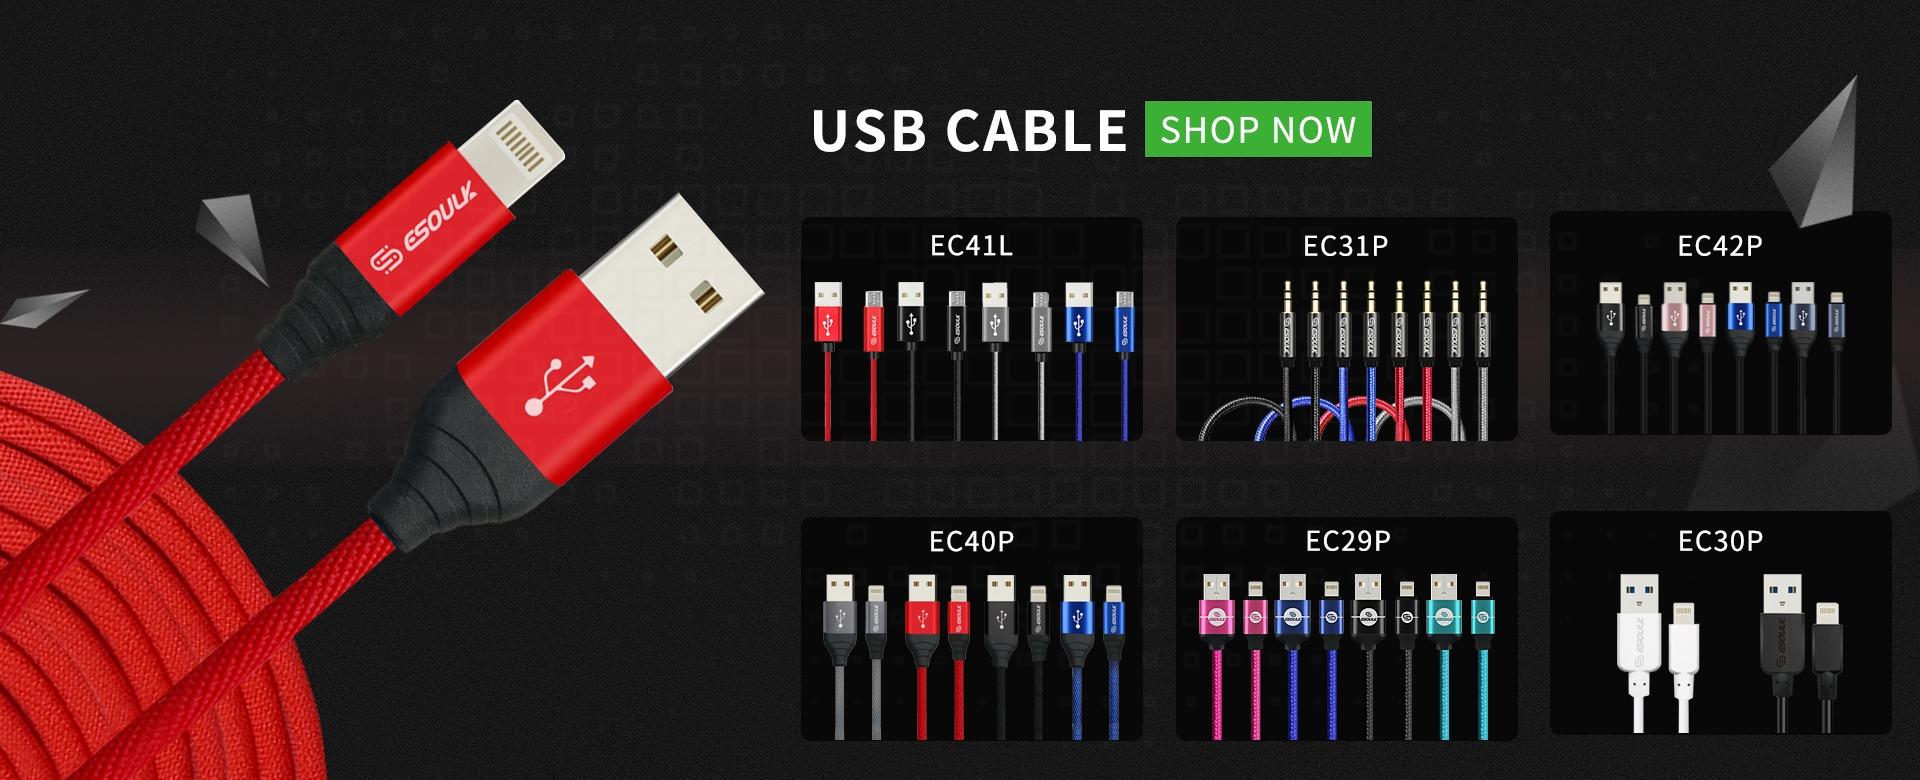 EC41L+EC31P+EC42P+EC40P+EC29P+EC30P+EC38P